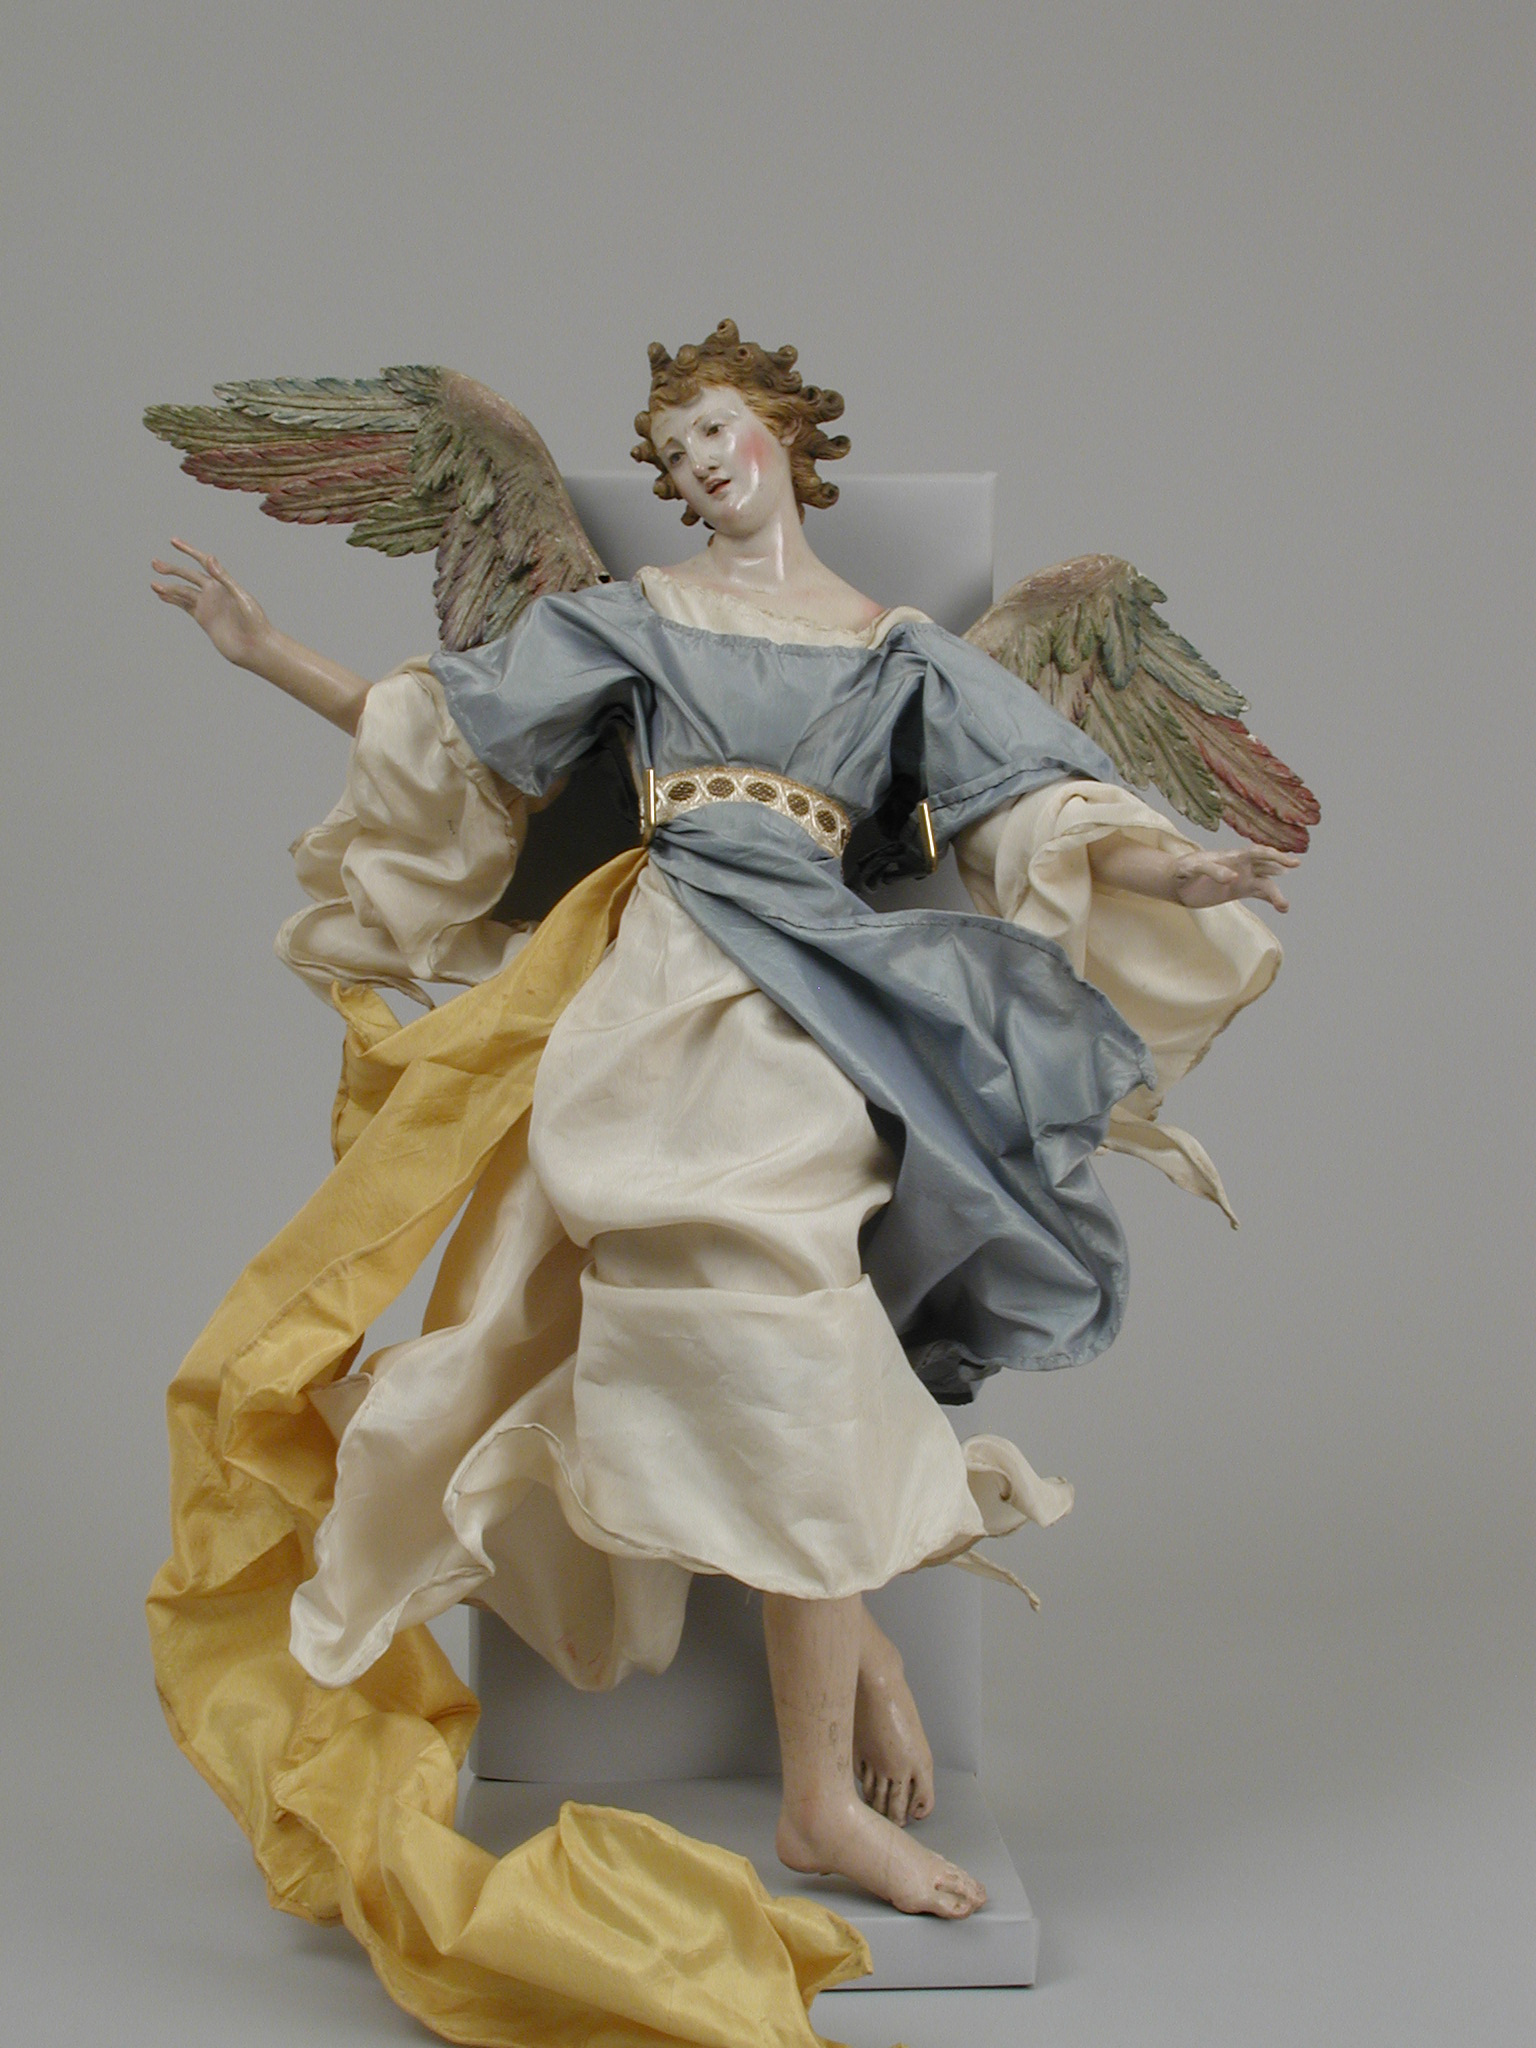 https://images.metmuseum.org/CRDImages/es/original/LC-69_294_14.jpg